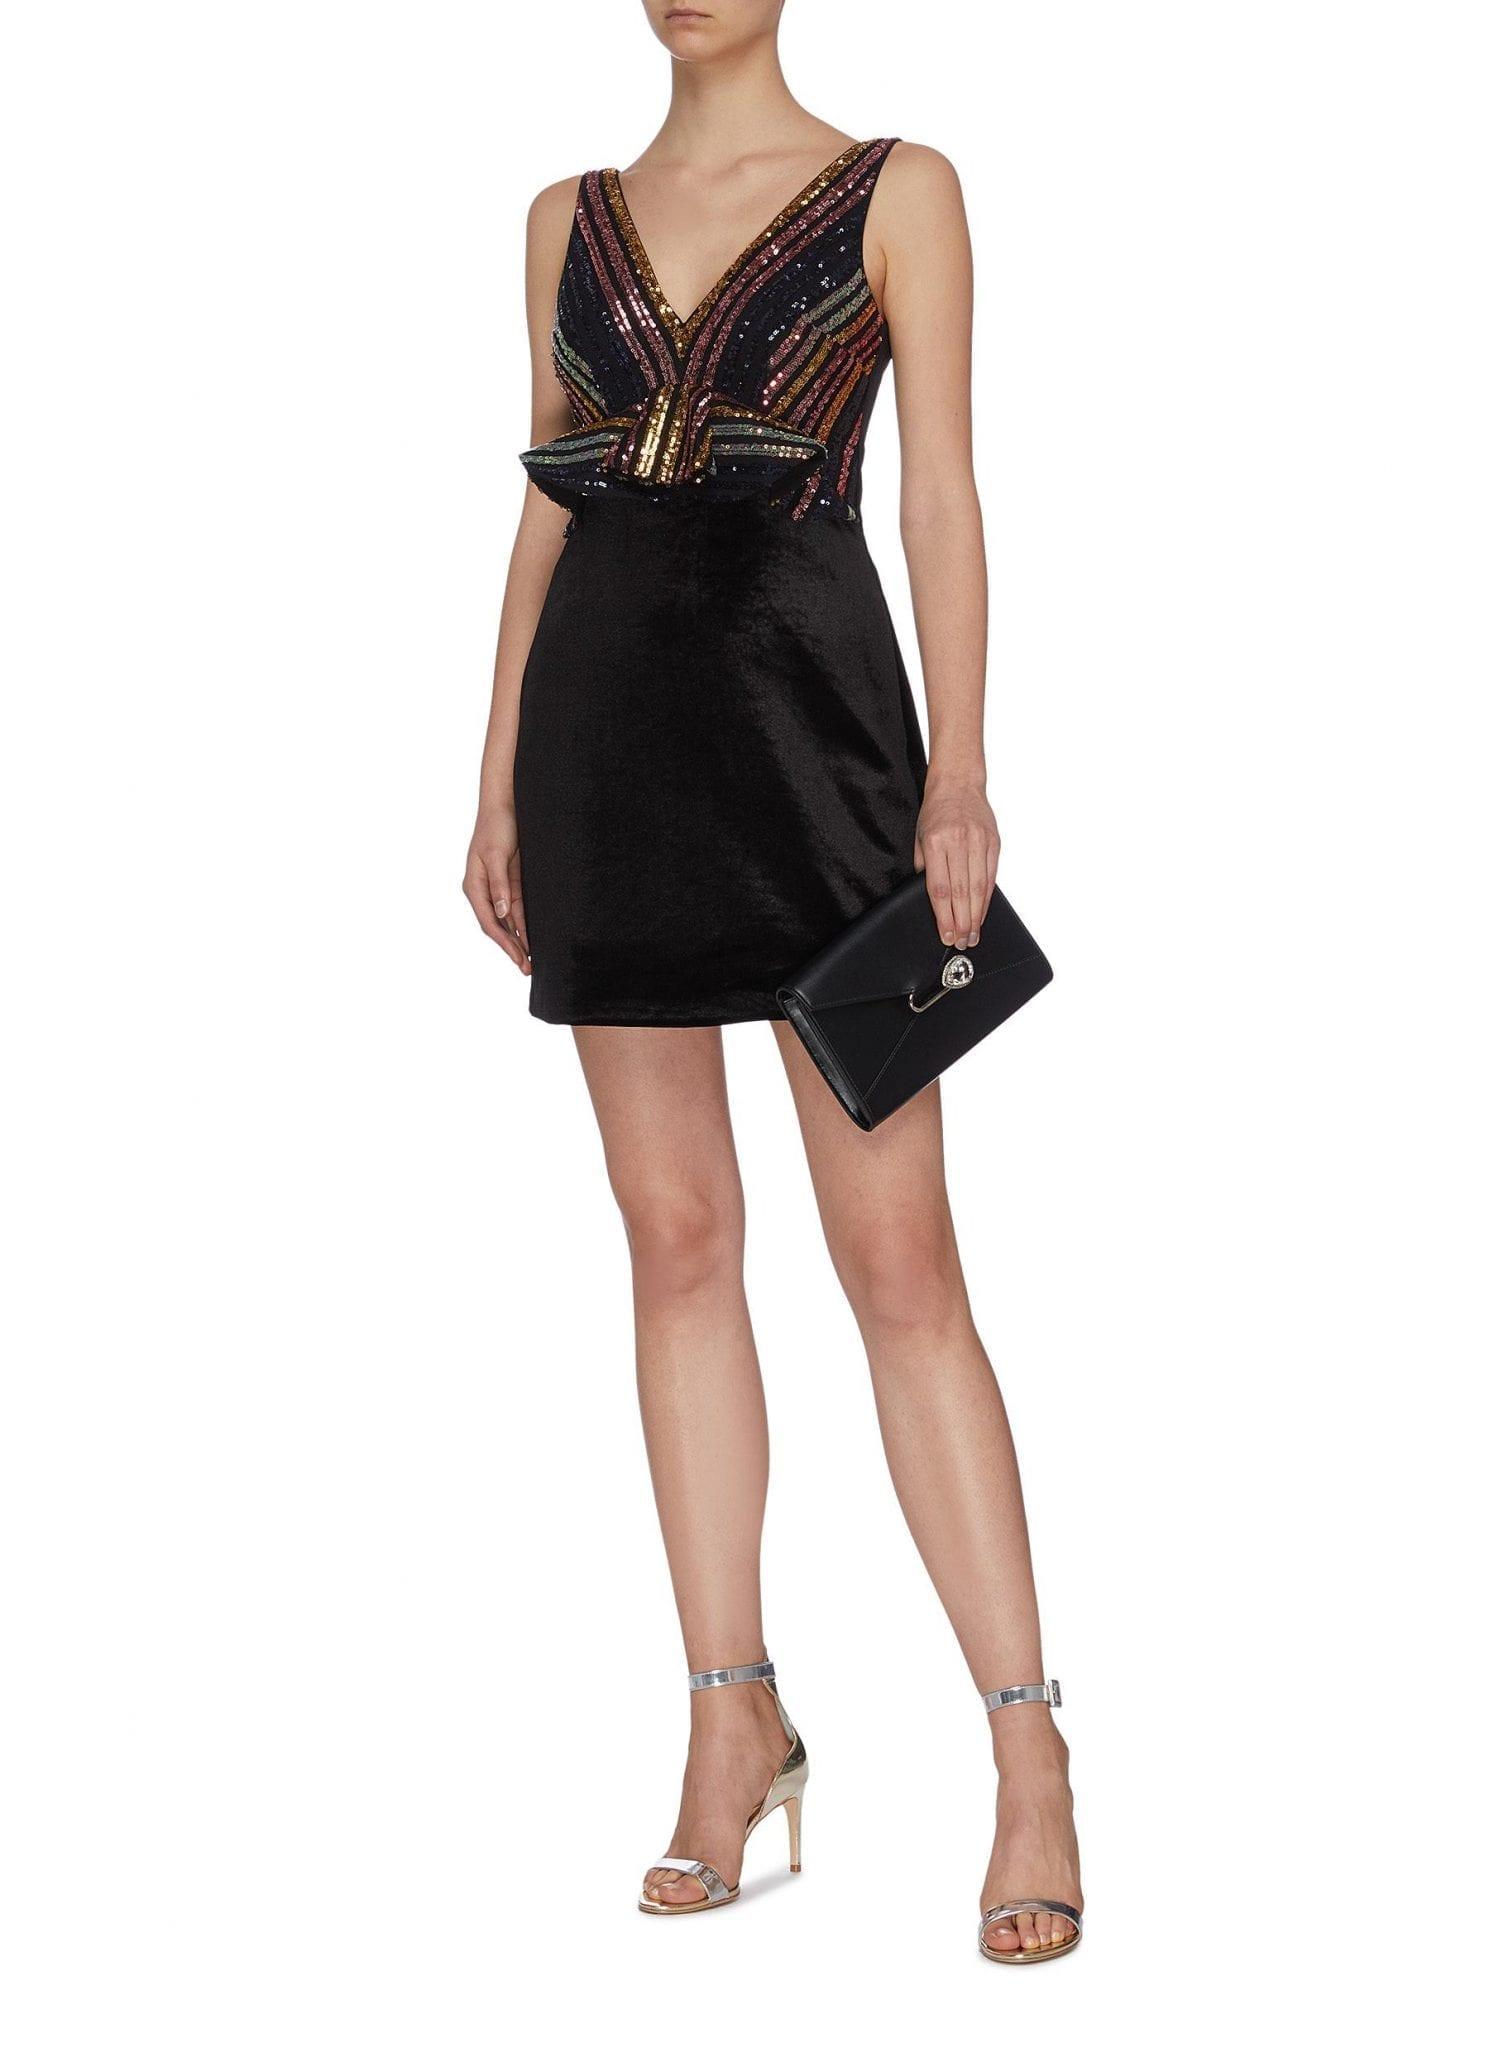 SELF-PORTRAIT Stripe Sequin Embellished Mini Dress